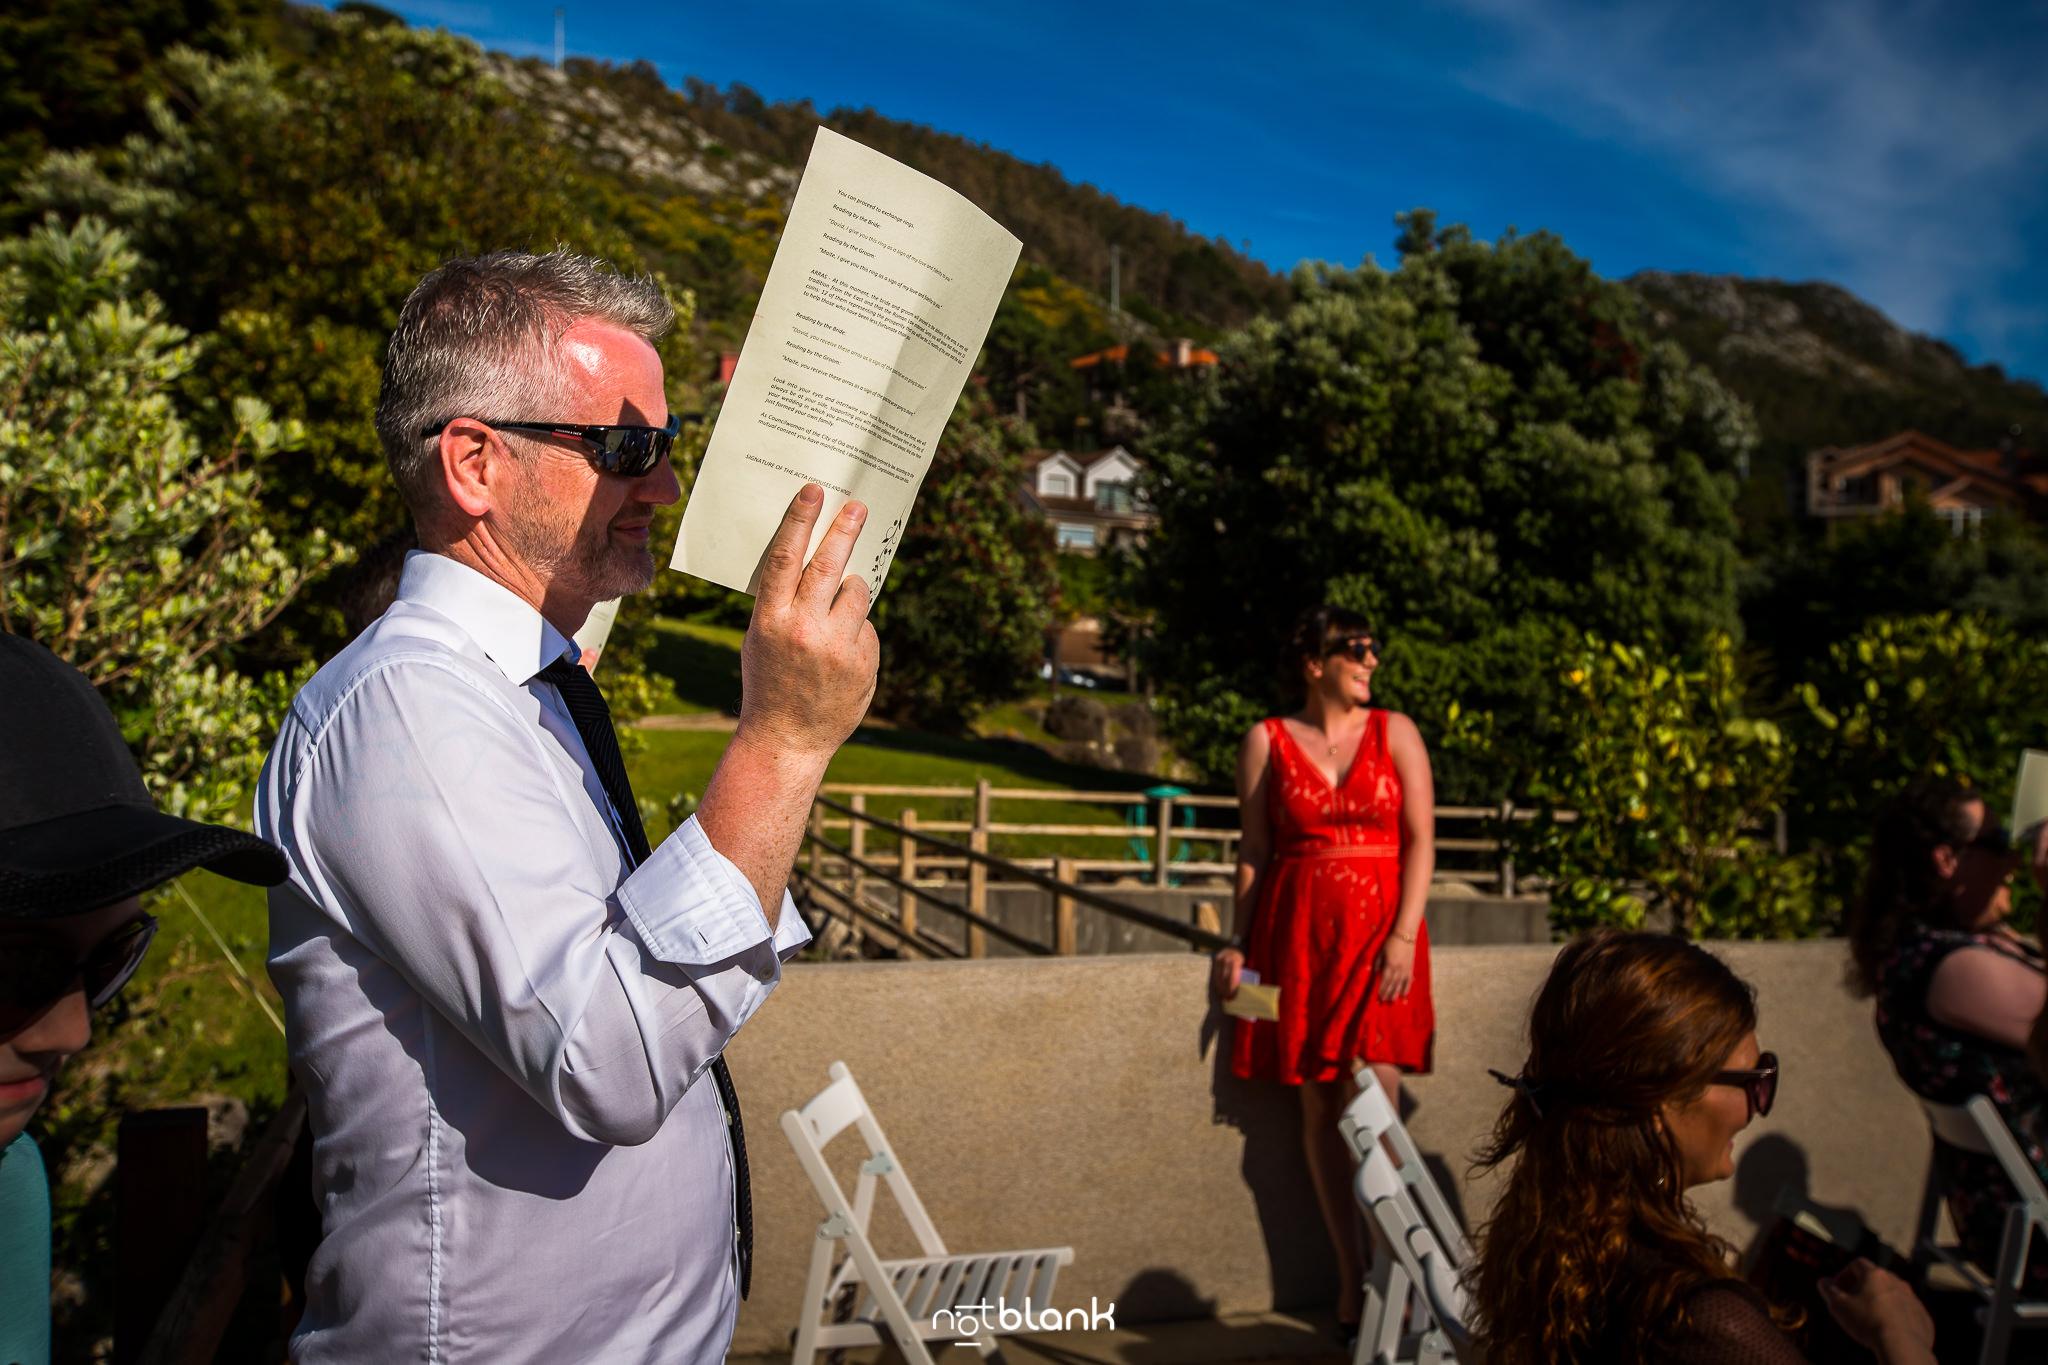 Boda-Maite-David-Invitado-Se-Proteje-Del-Sol-En-Ceremonia-Civil-Talaso-Atlantico. Reportaje realizado por Notblank fotógrafos de boda